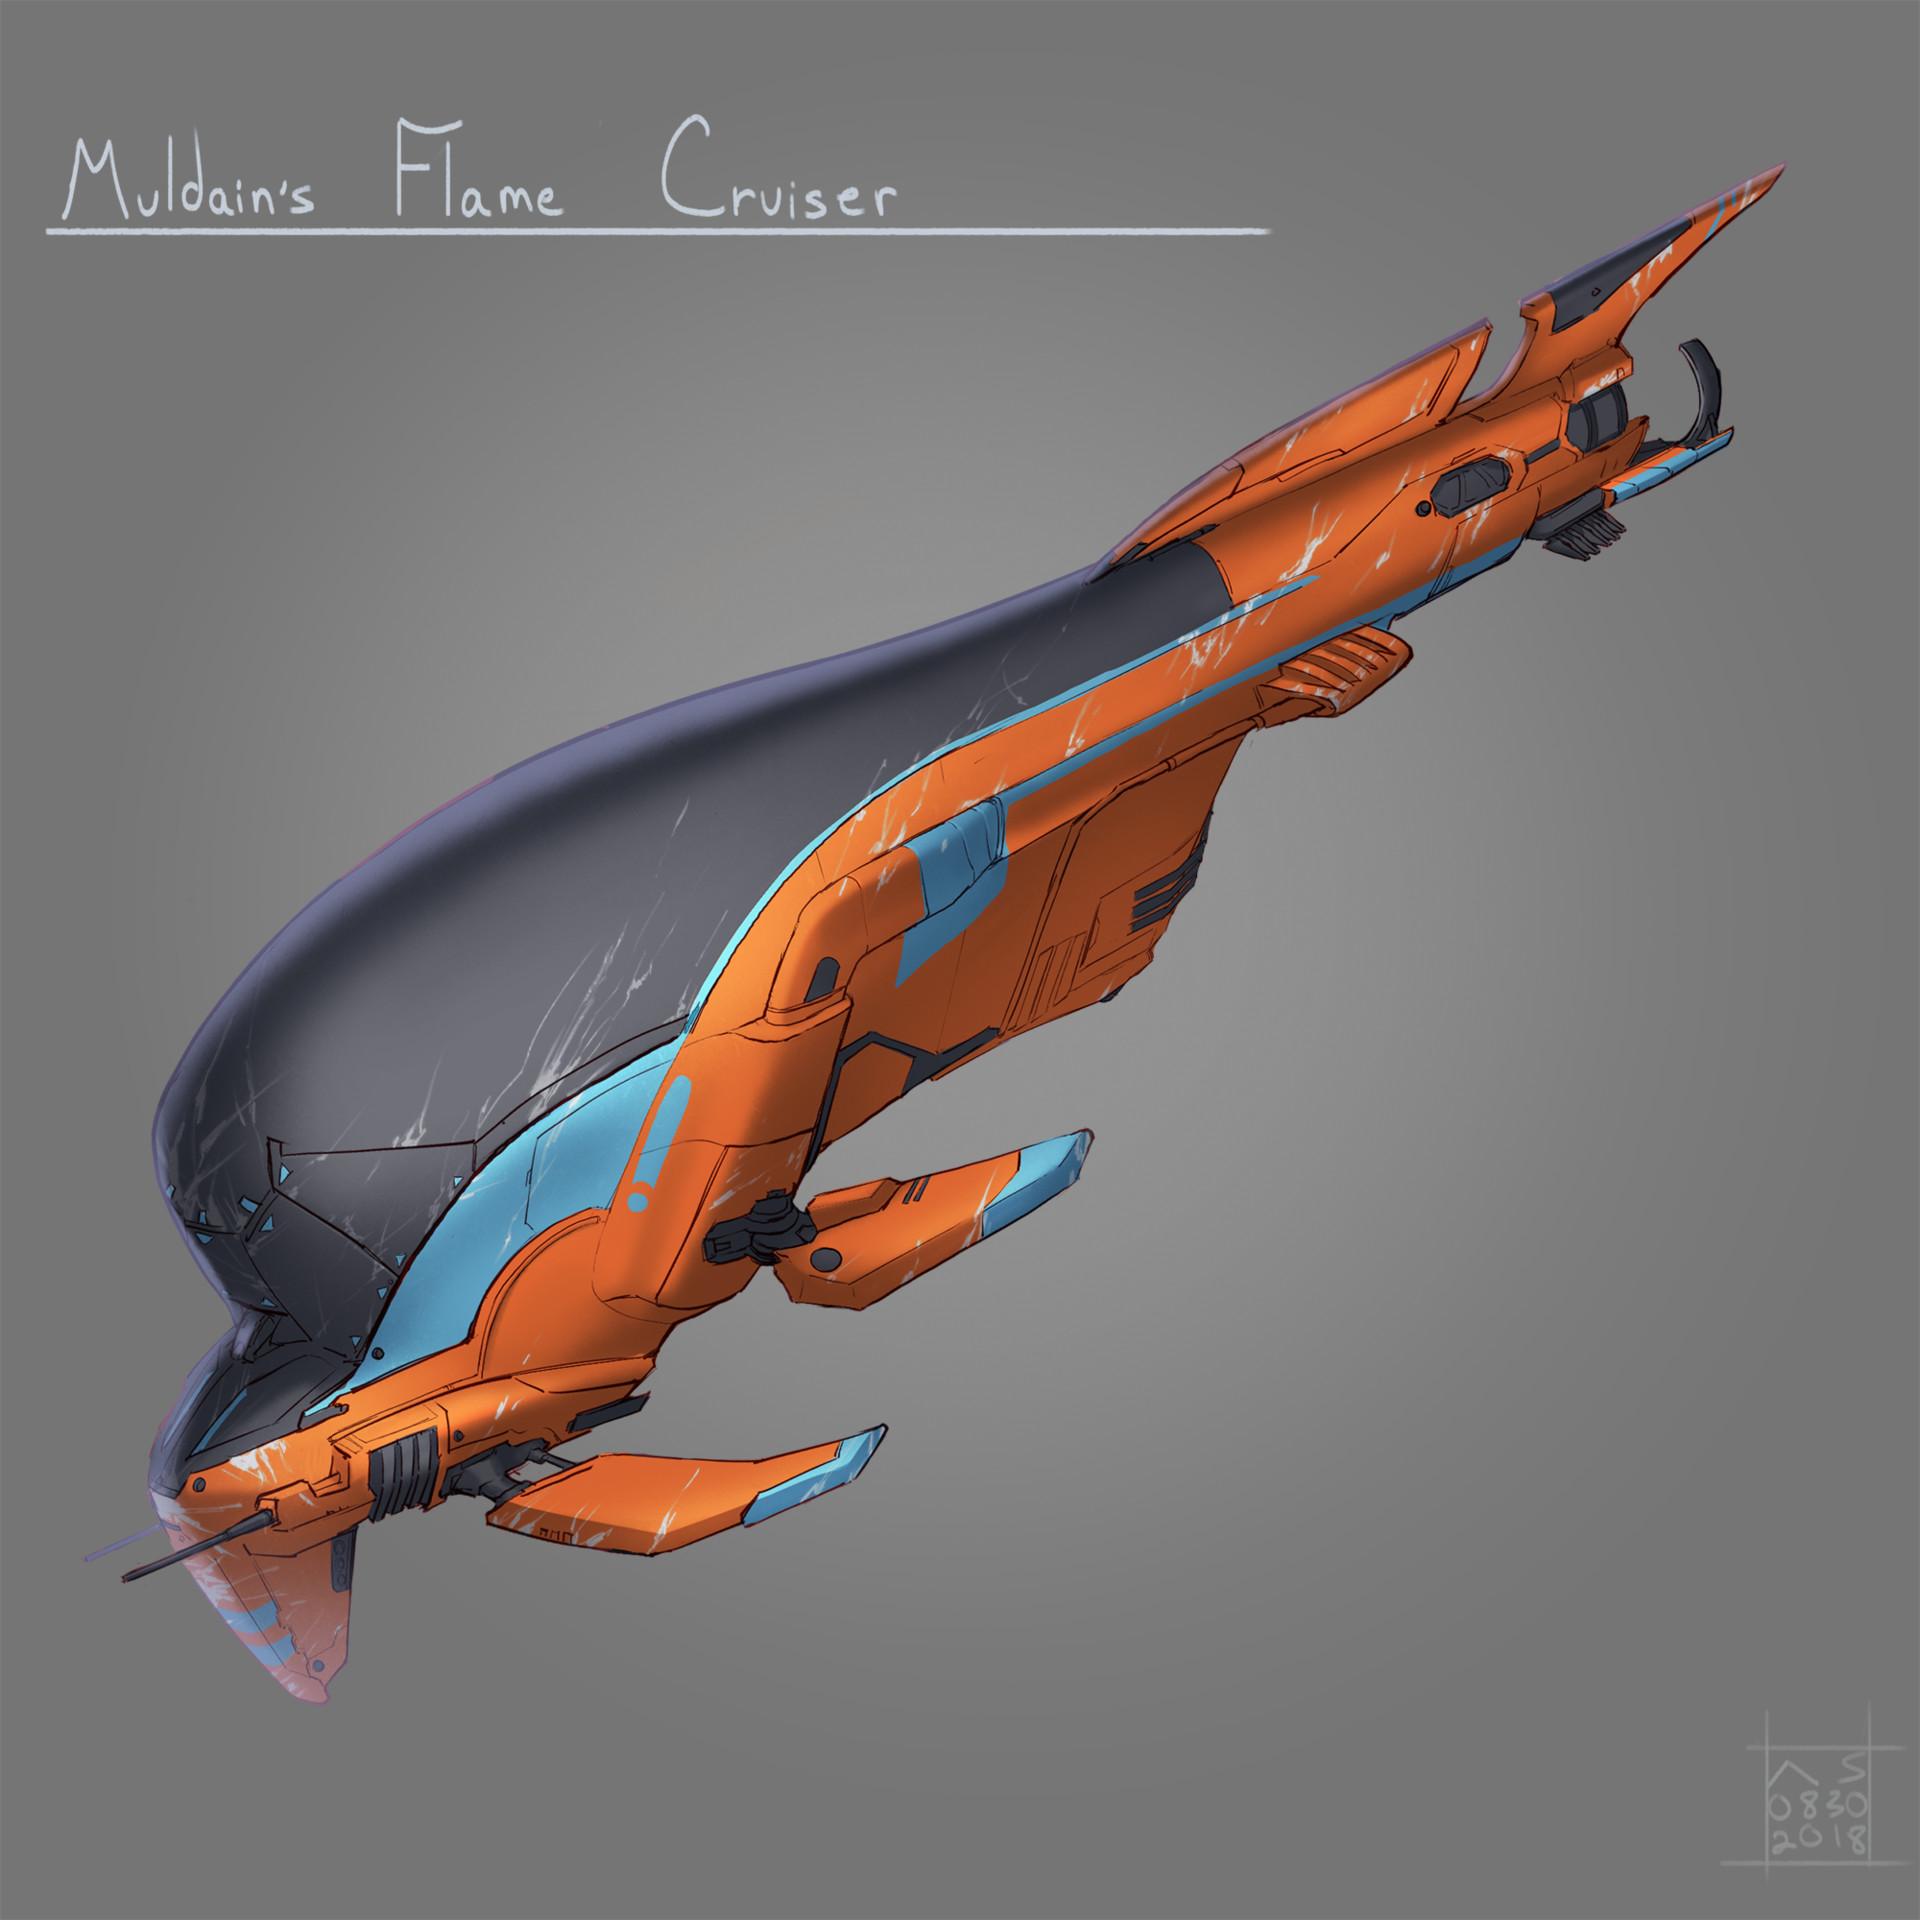 Ameilee sullivan cruiser1fin